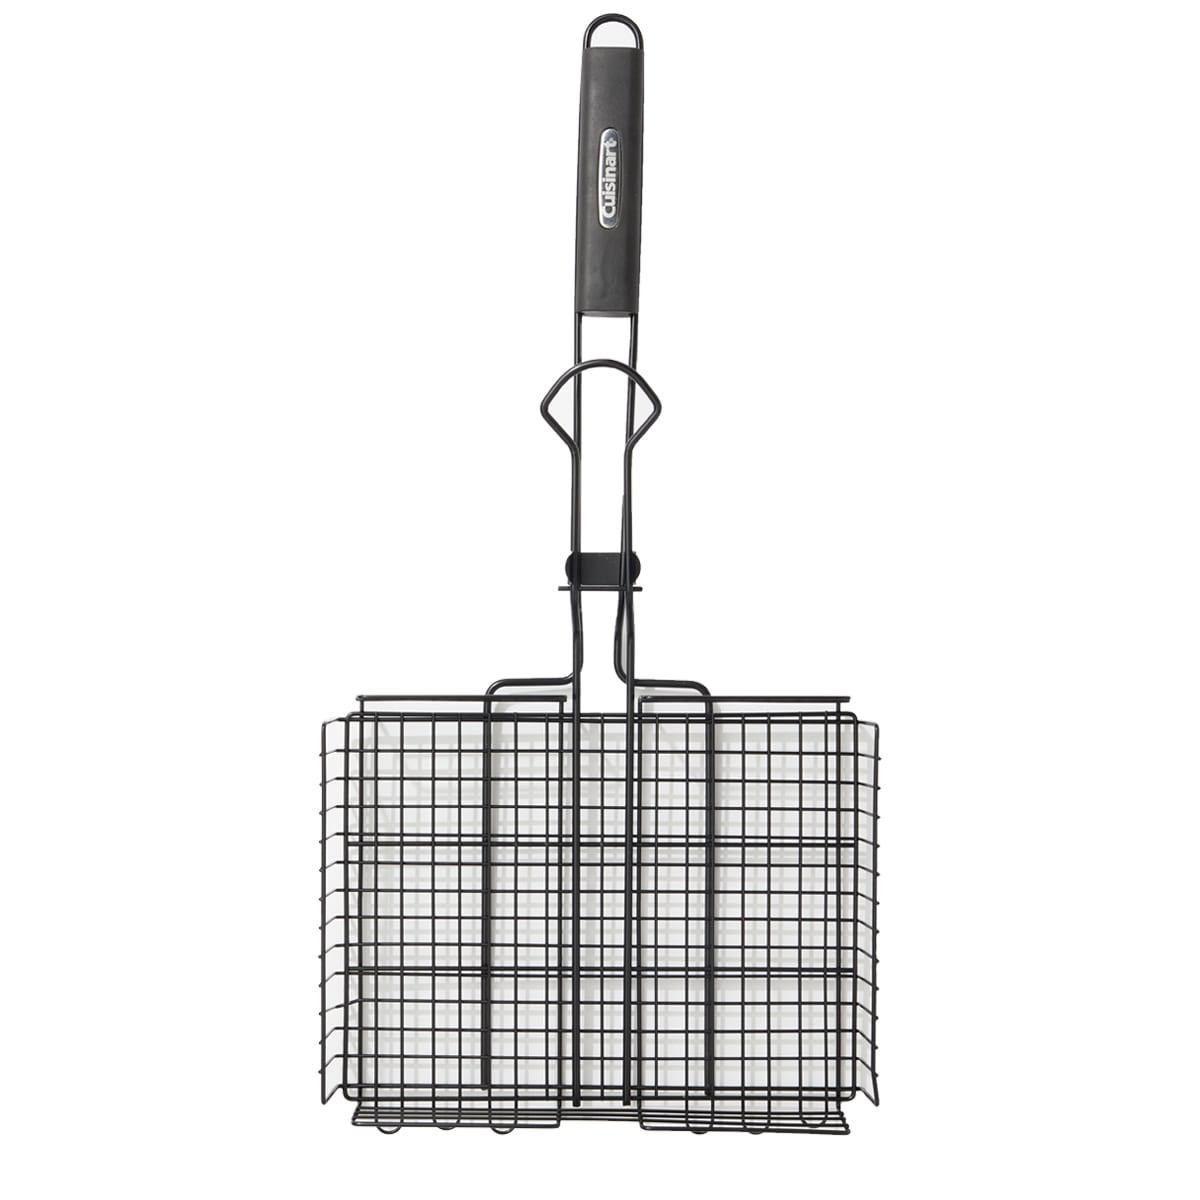 Cuisinart® Non-Stick Grilling Basket